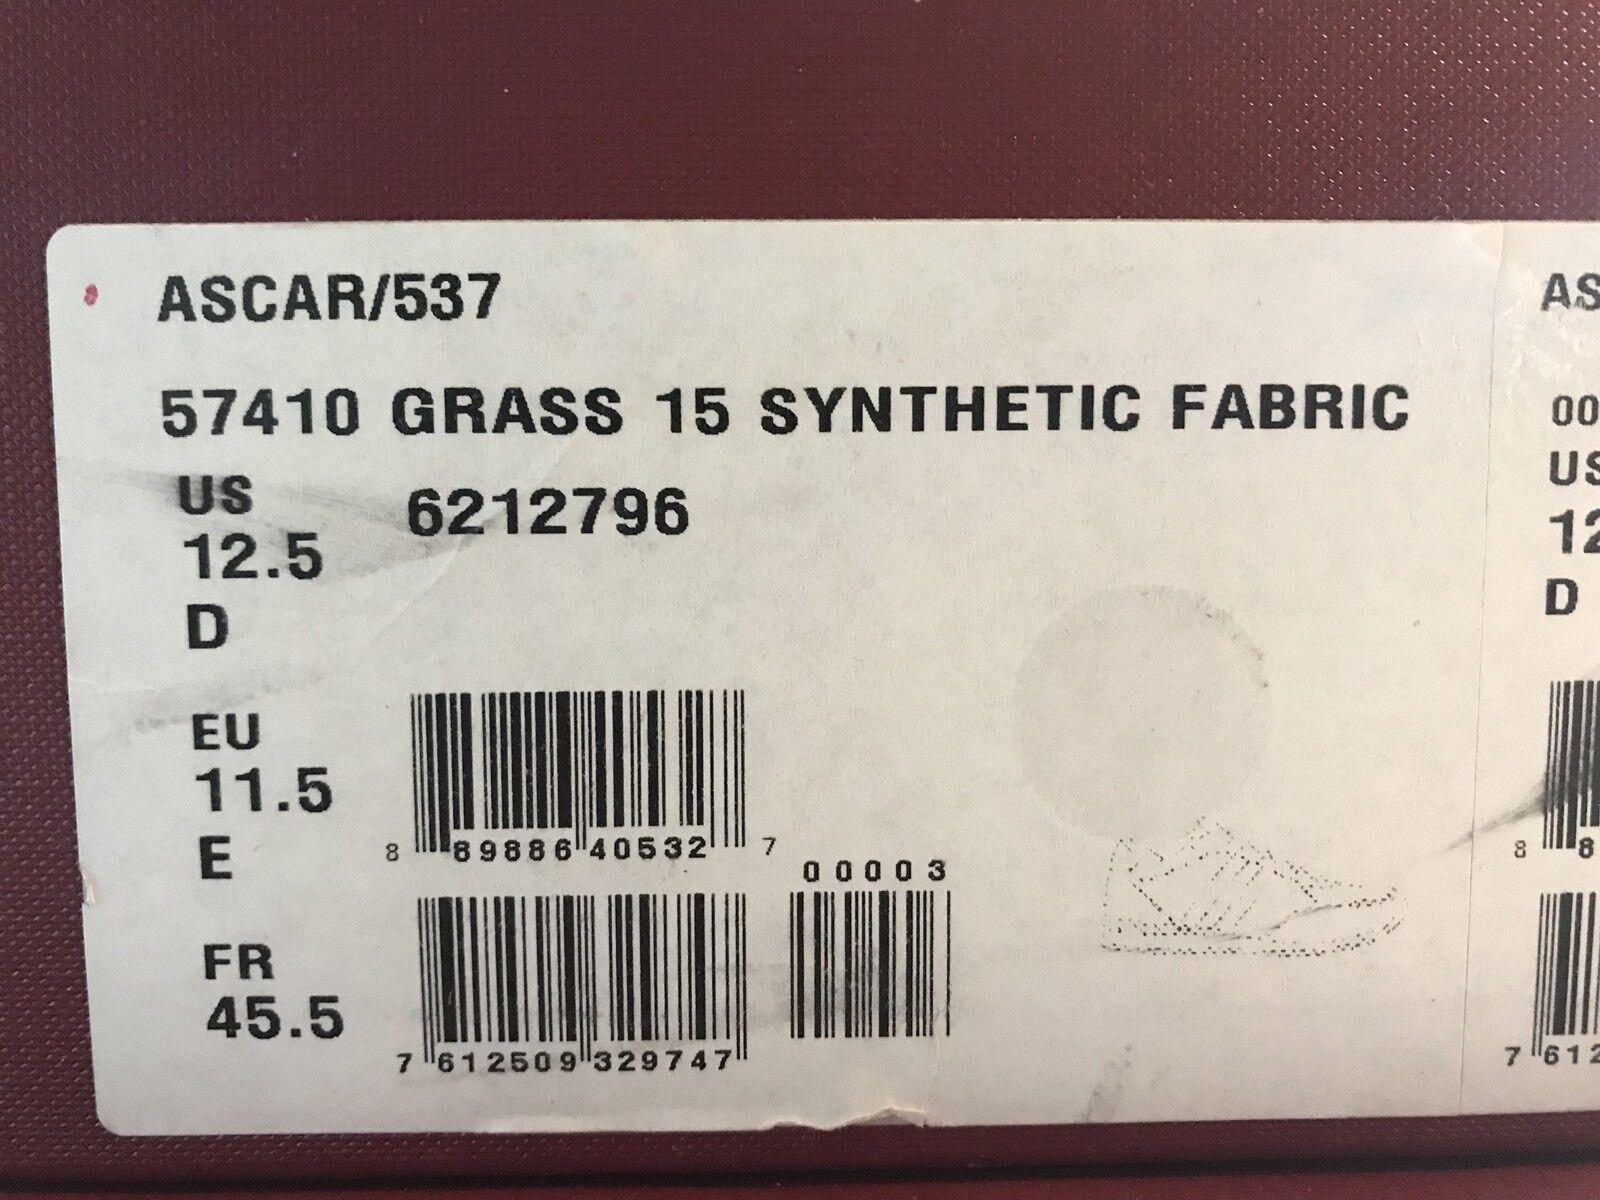 700  Bally Ascar  Grass Pelle  size   Ascar 12.5 Made In Italy 23f1d0